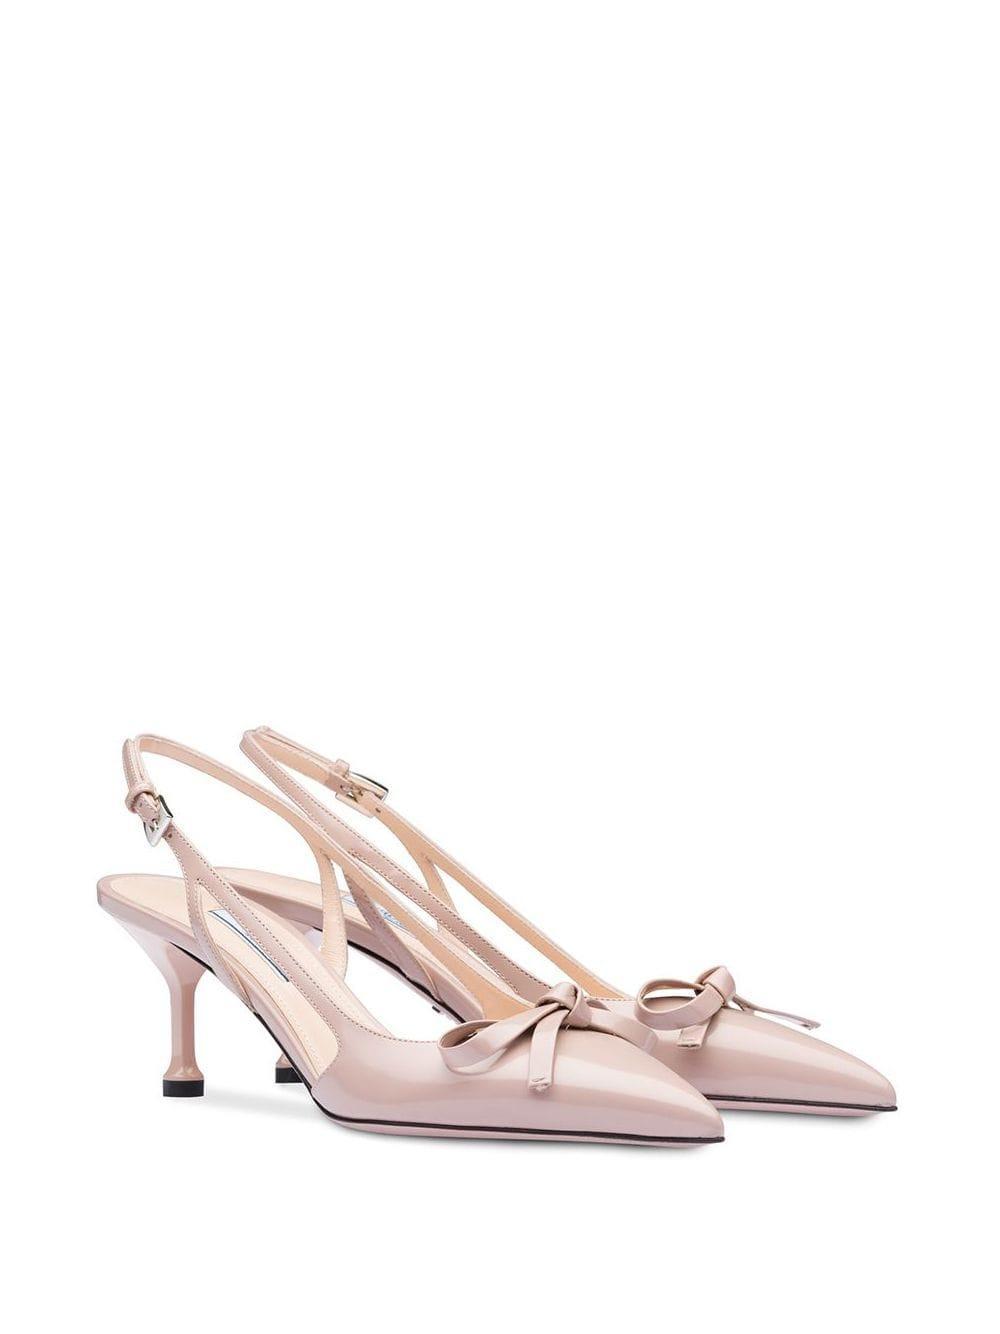 Zapatos de tacón con tira trasera Prada de Cuero de color Rosa